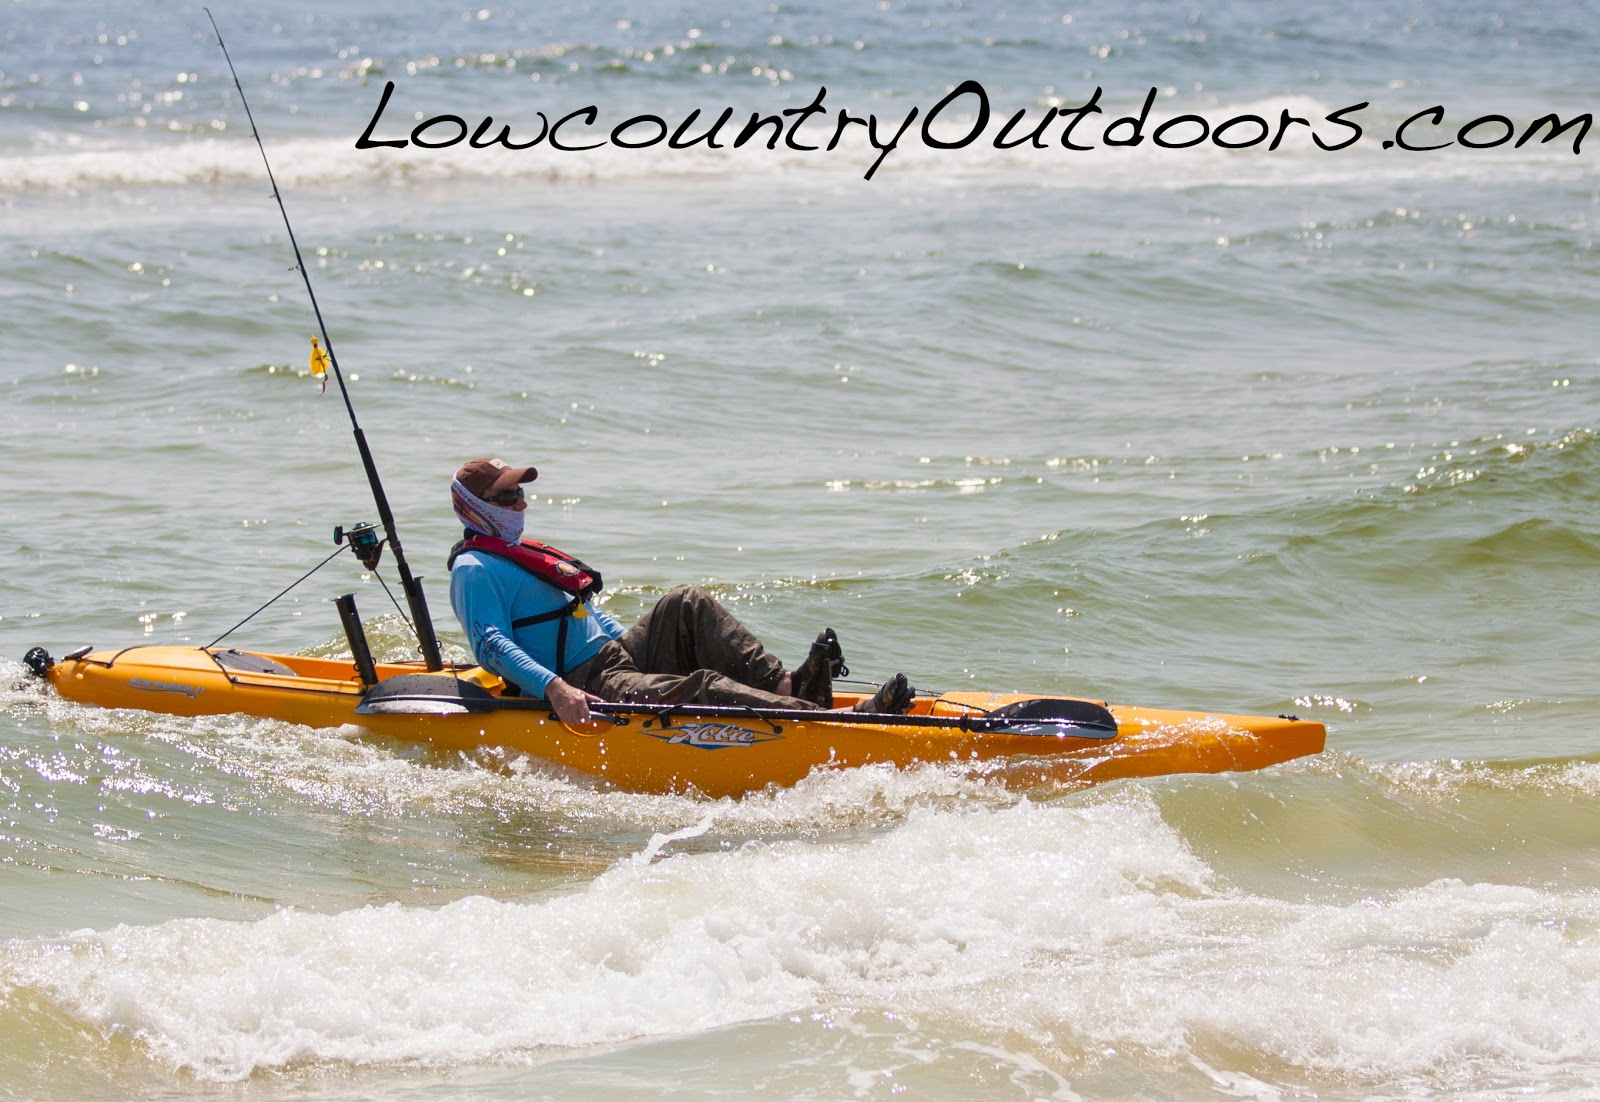 Lowcountry outdoors fishing the forgotten coast via hobie for Surf fishing panama city beach